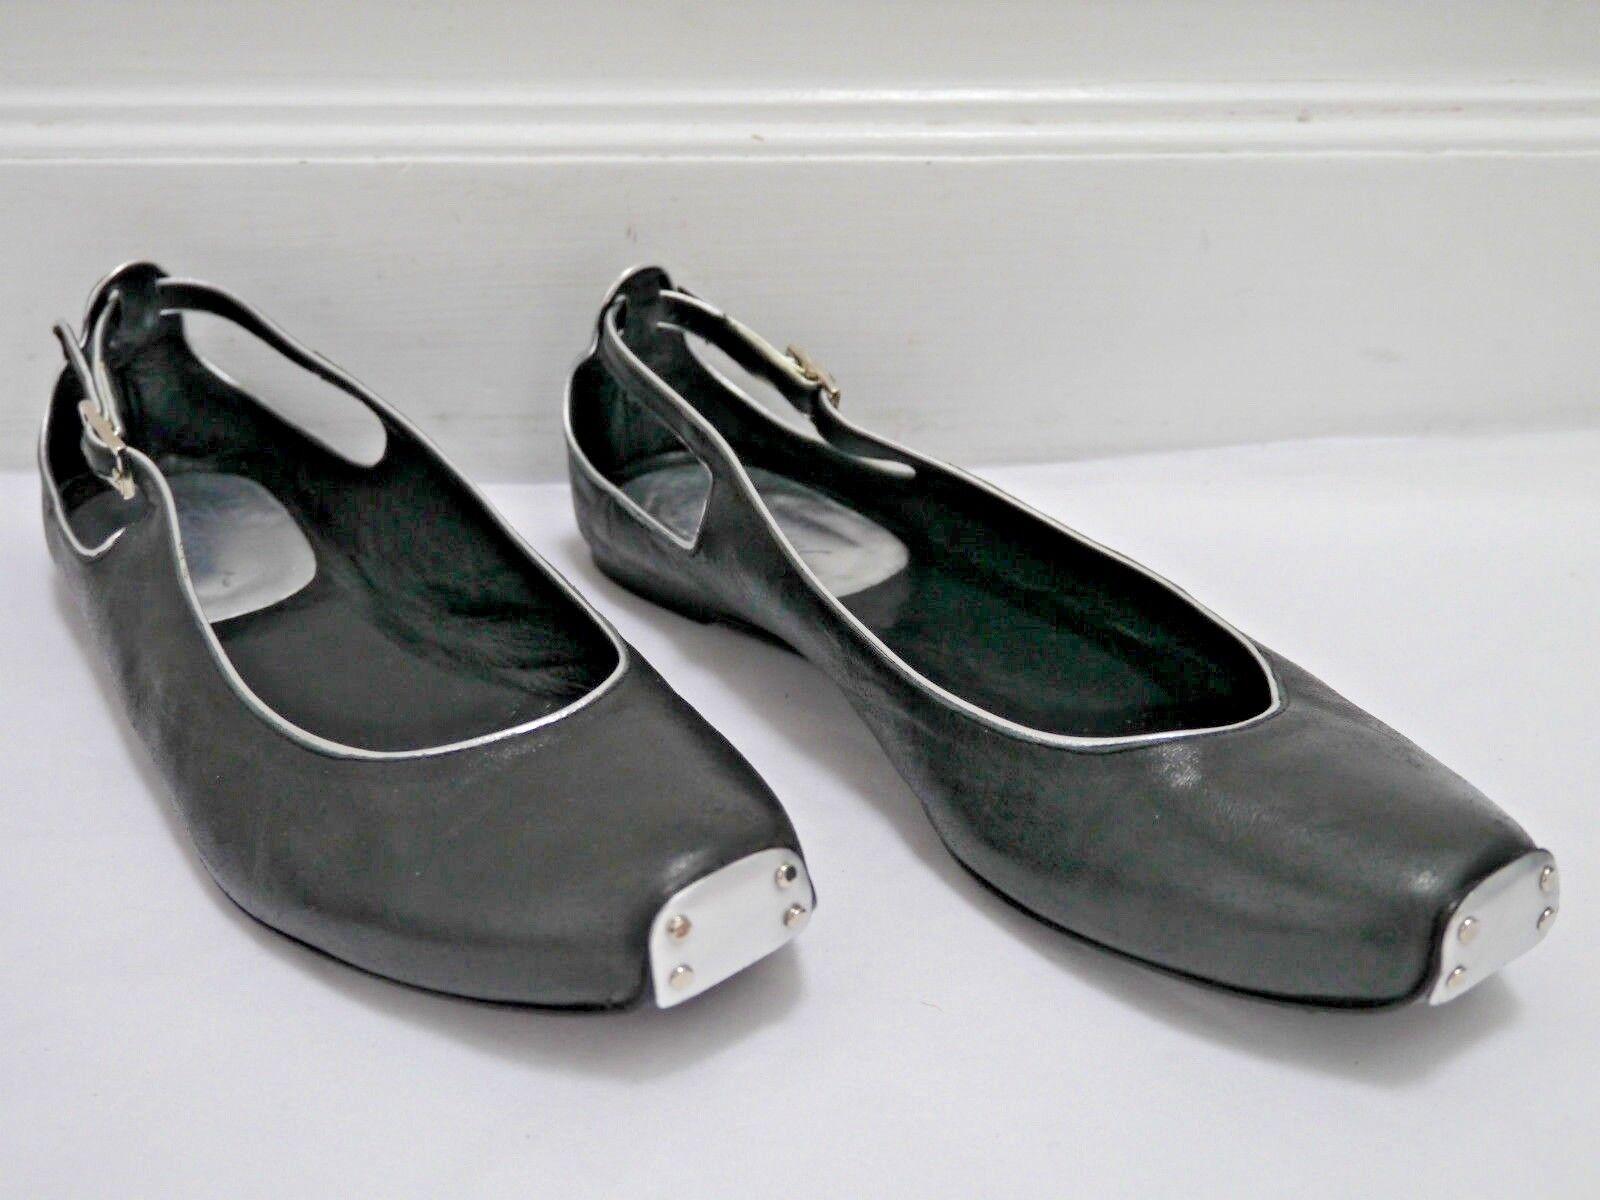 TASHKENT by CHEYENNE black leather ballet flats with silver trim Italian size 40